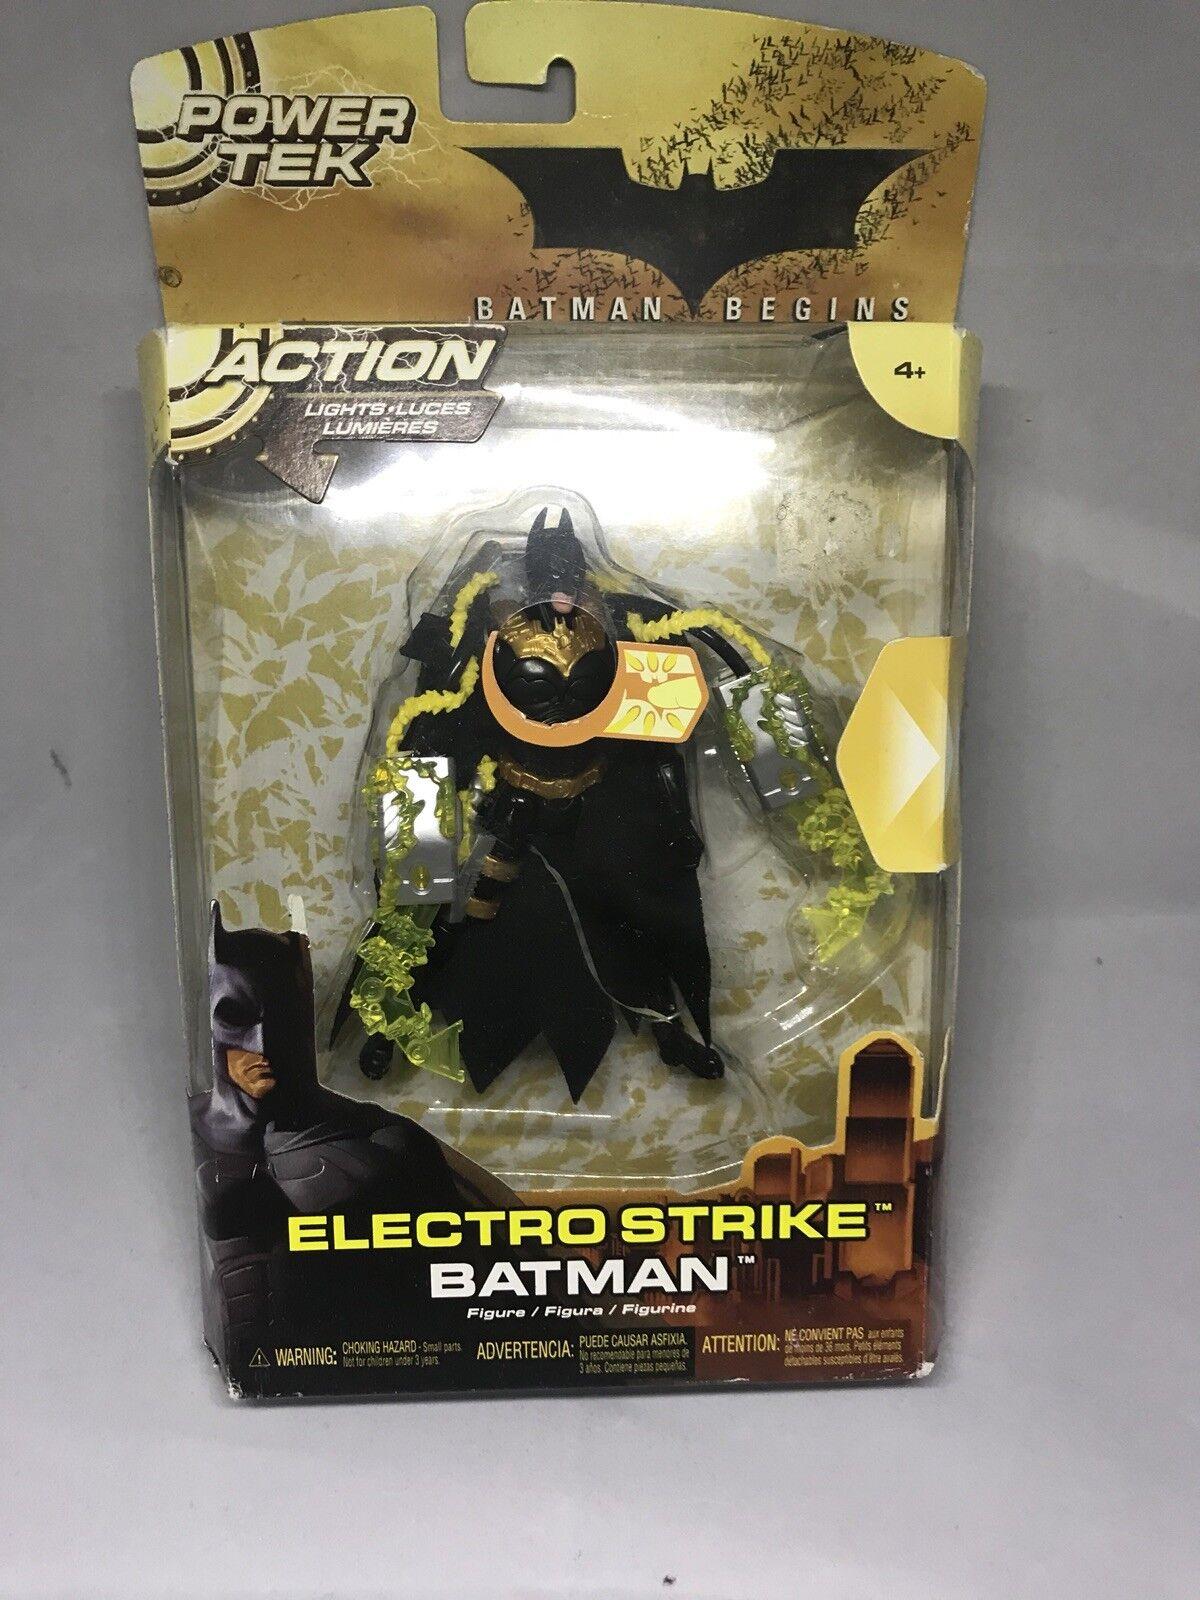 Batman Begins Electro Strike Batman 5.5 in Action Figure Power Tek Mattel 2005